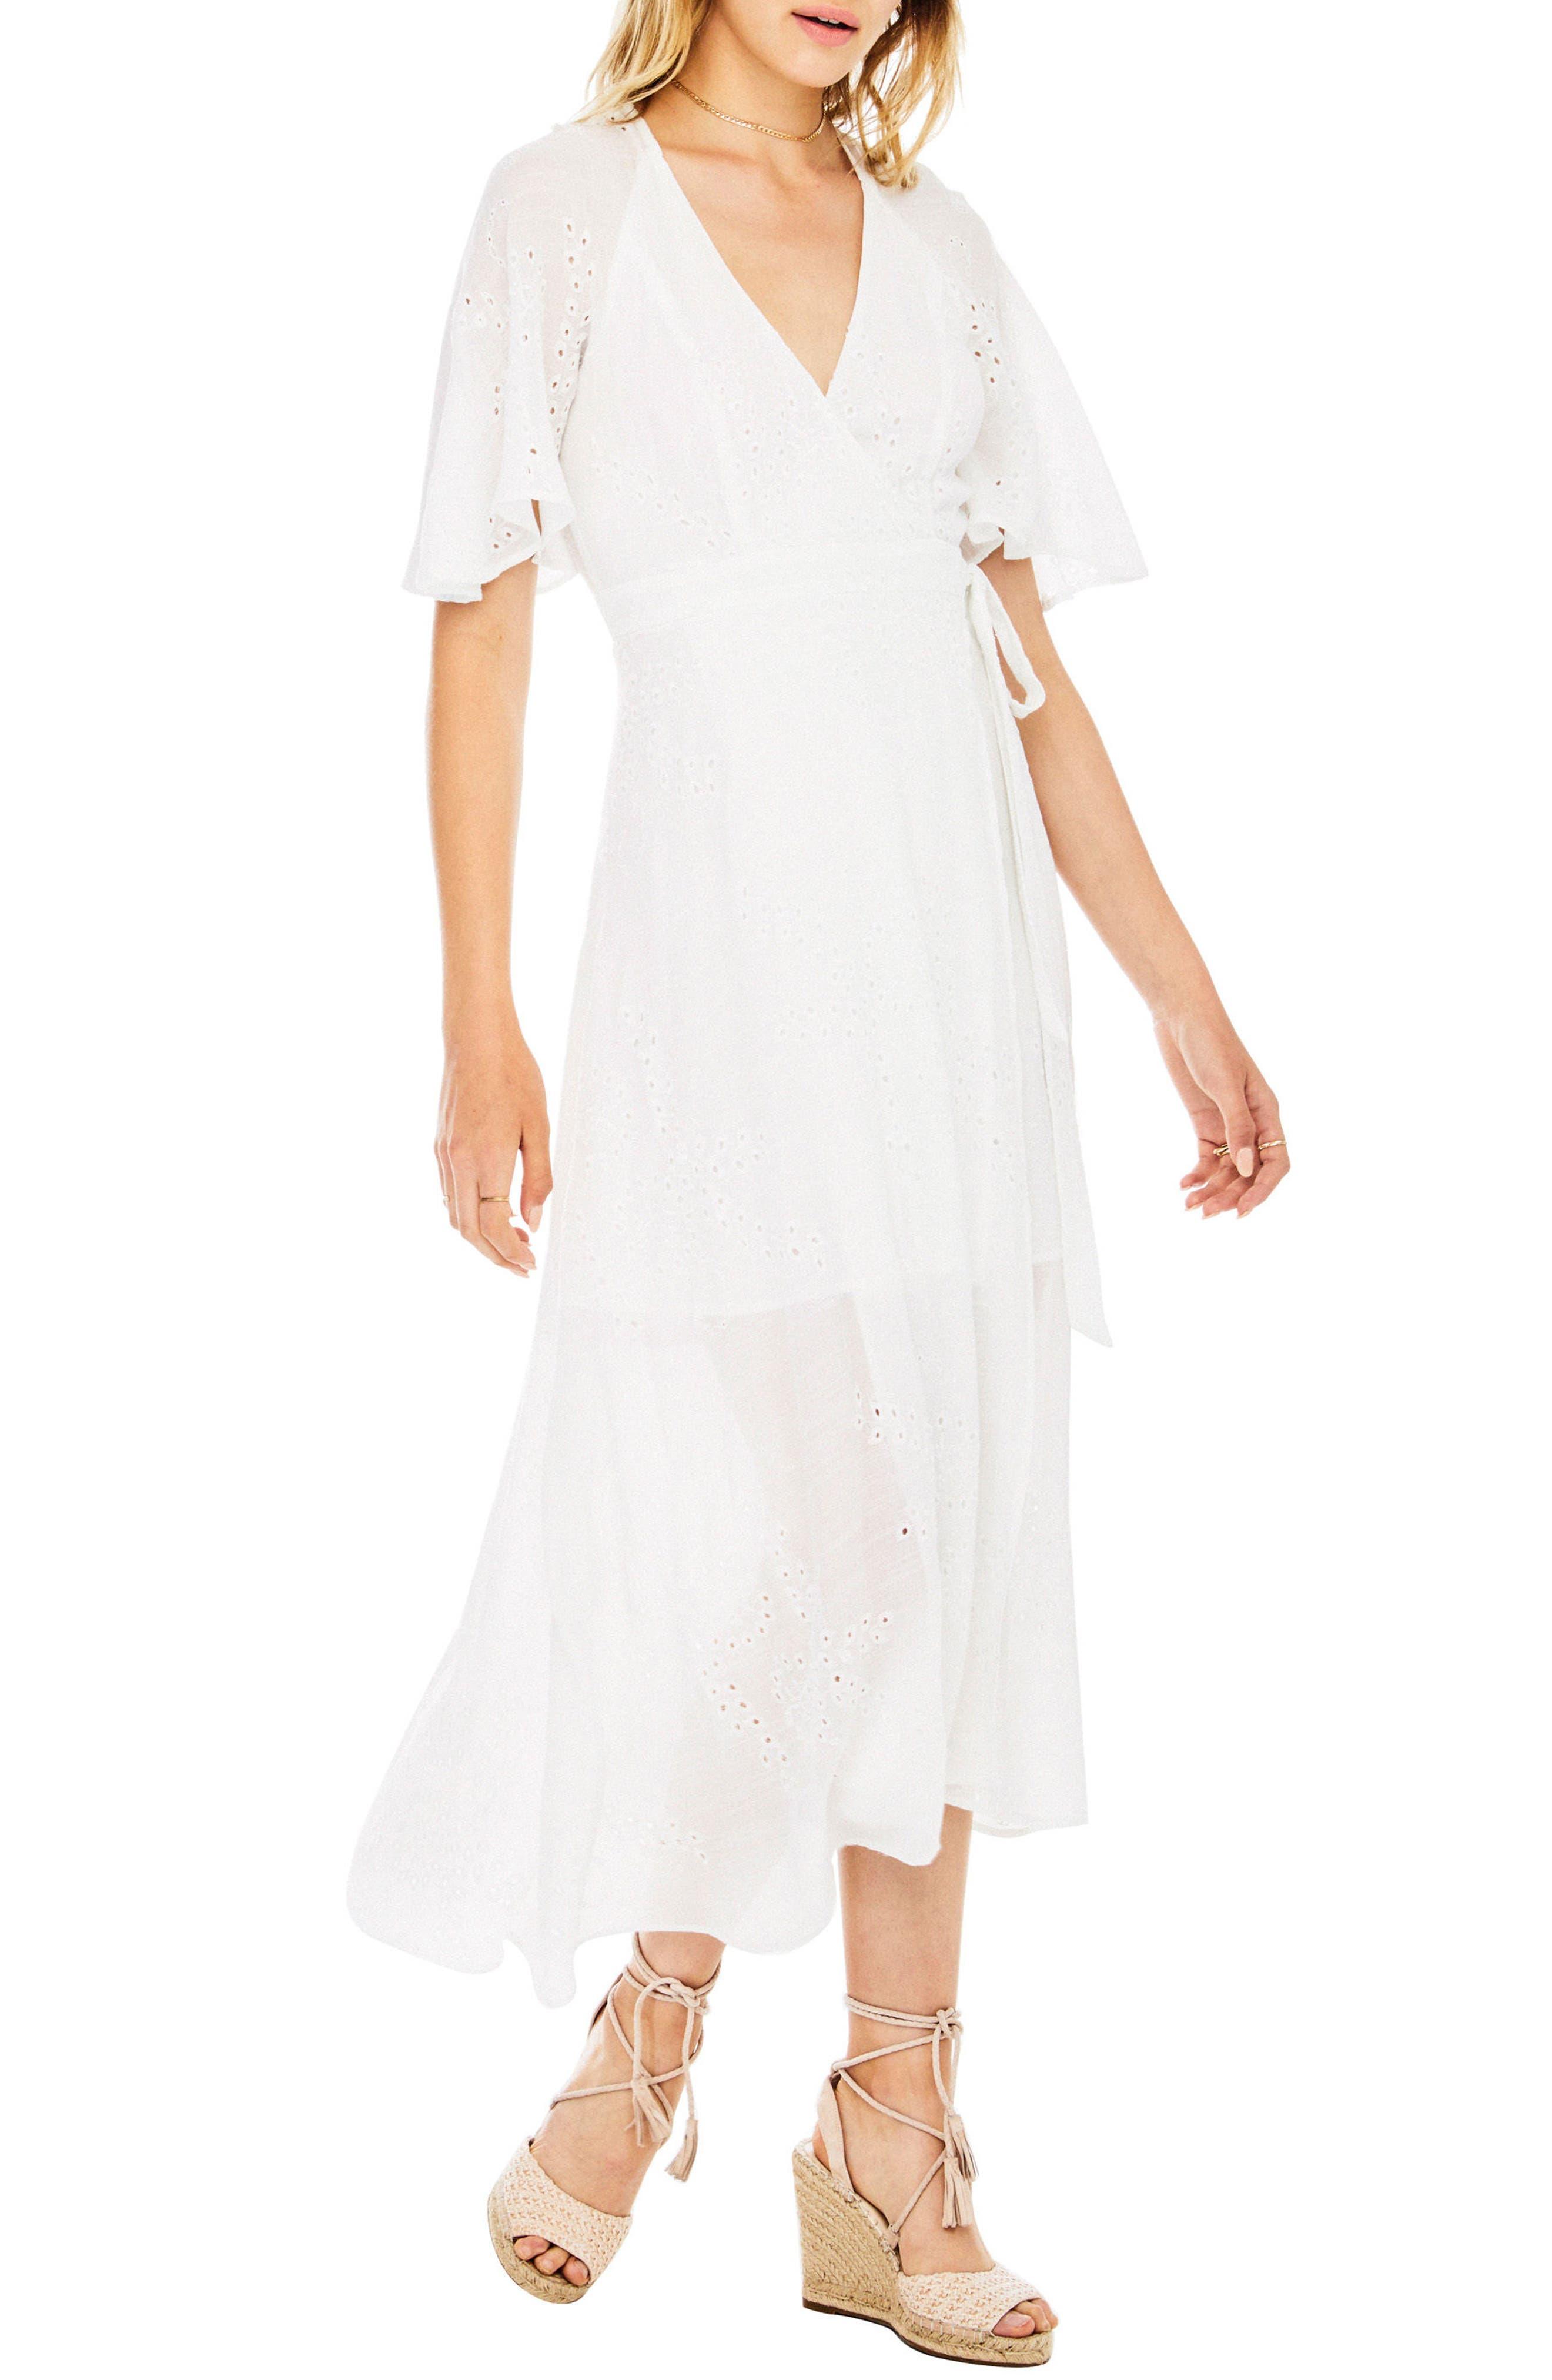 Gretchen Eyelet Wrap Dress,                             Alternate thumbnail 3, color,                             100